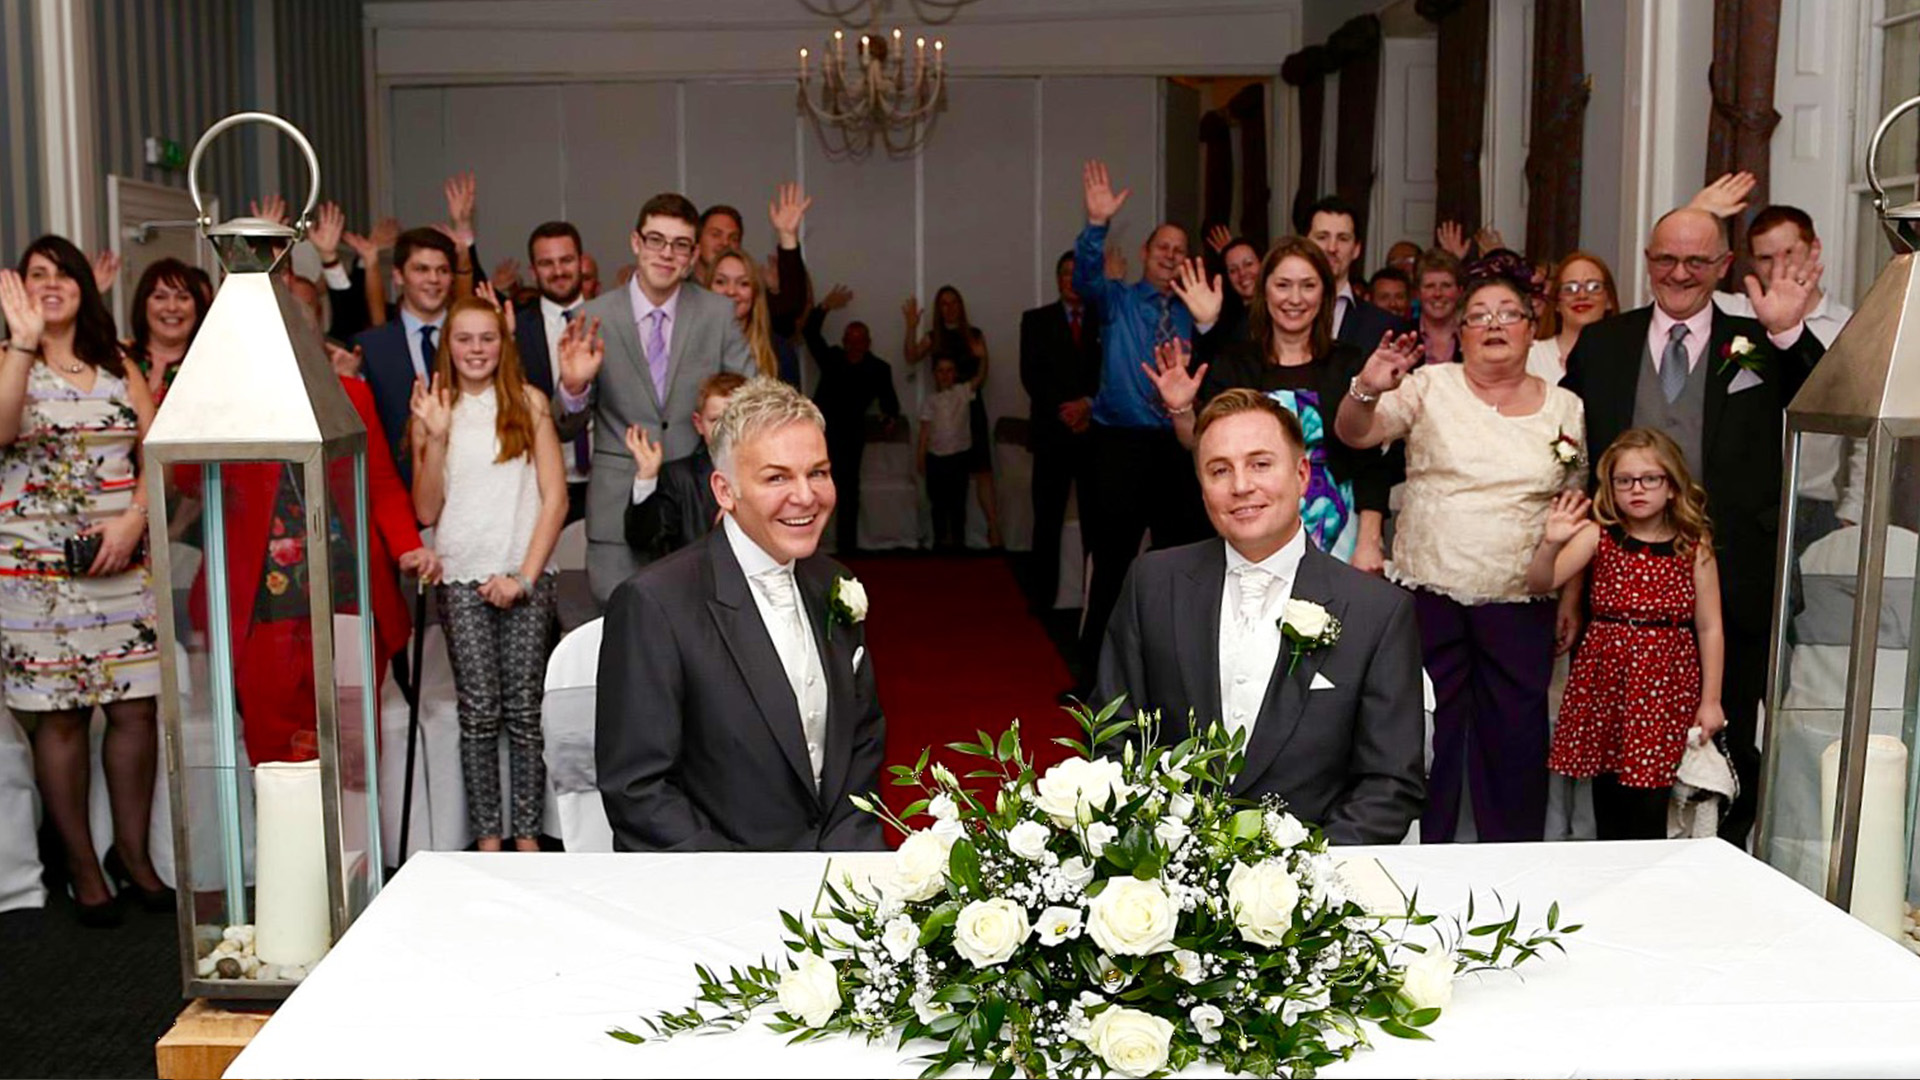 Wedding Venues in Hampshire Mercure Southampton Centre Dolphin Hotel Civil Partnership venues in Hampshire 3